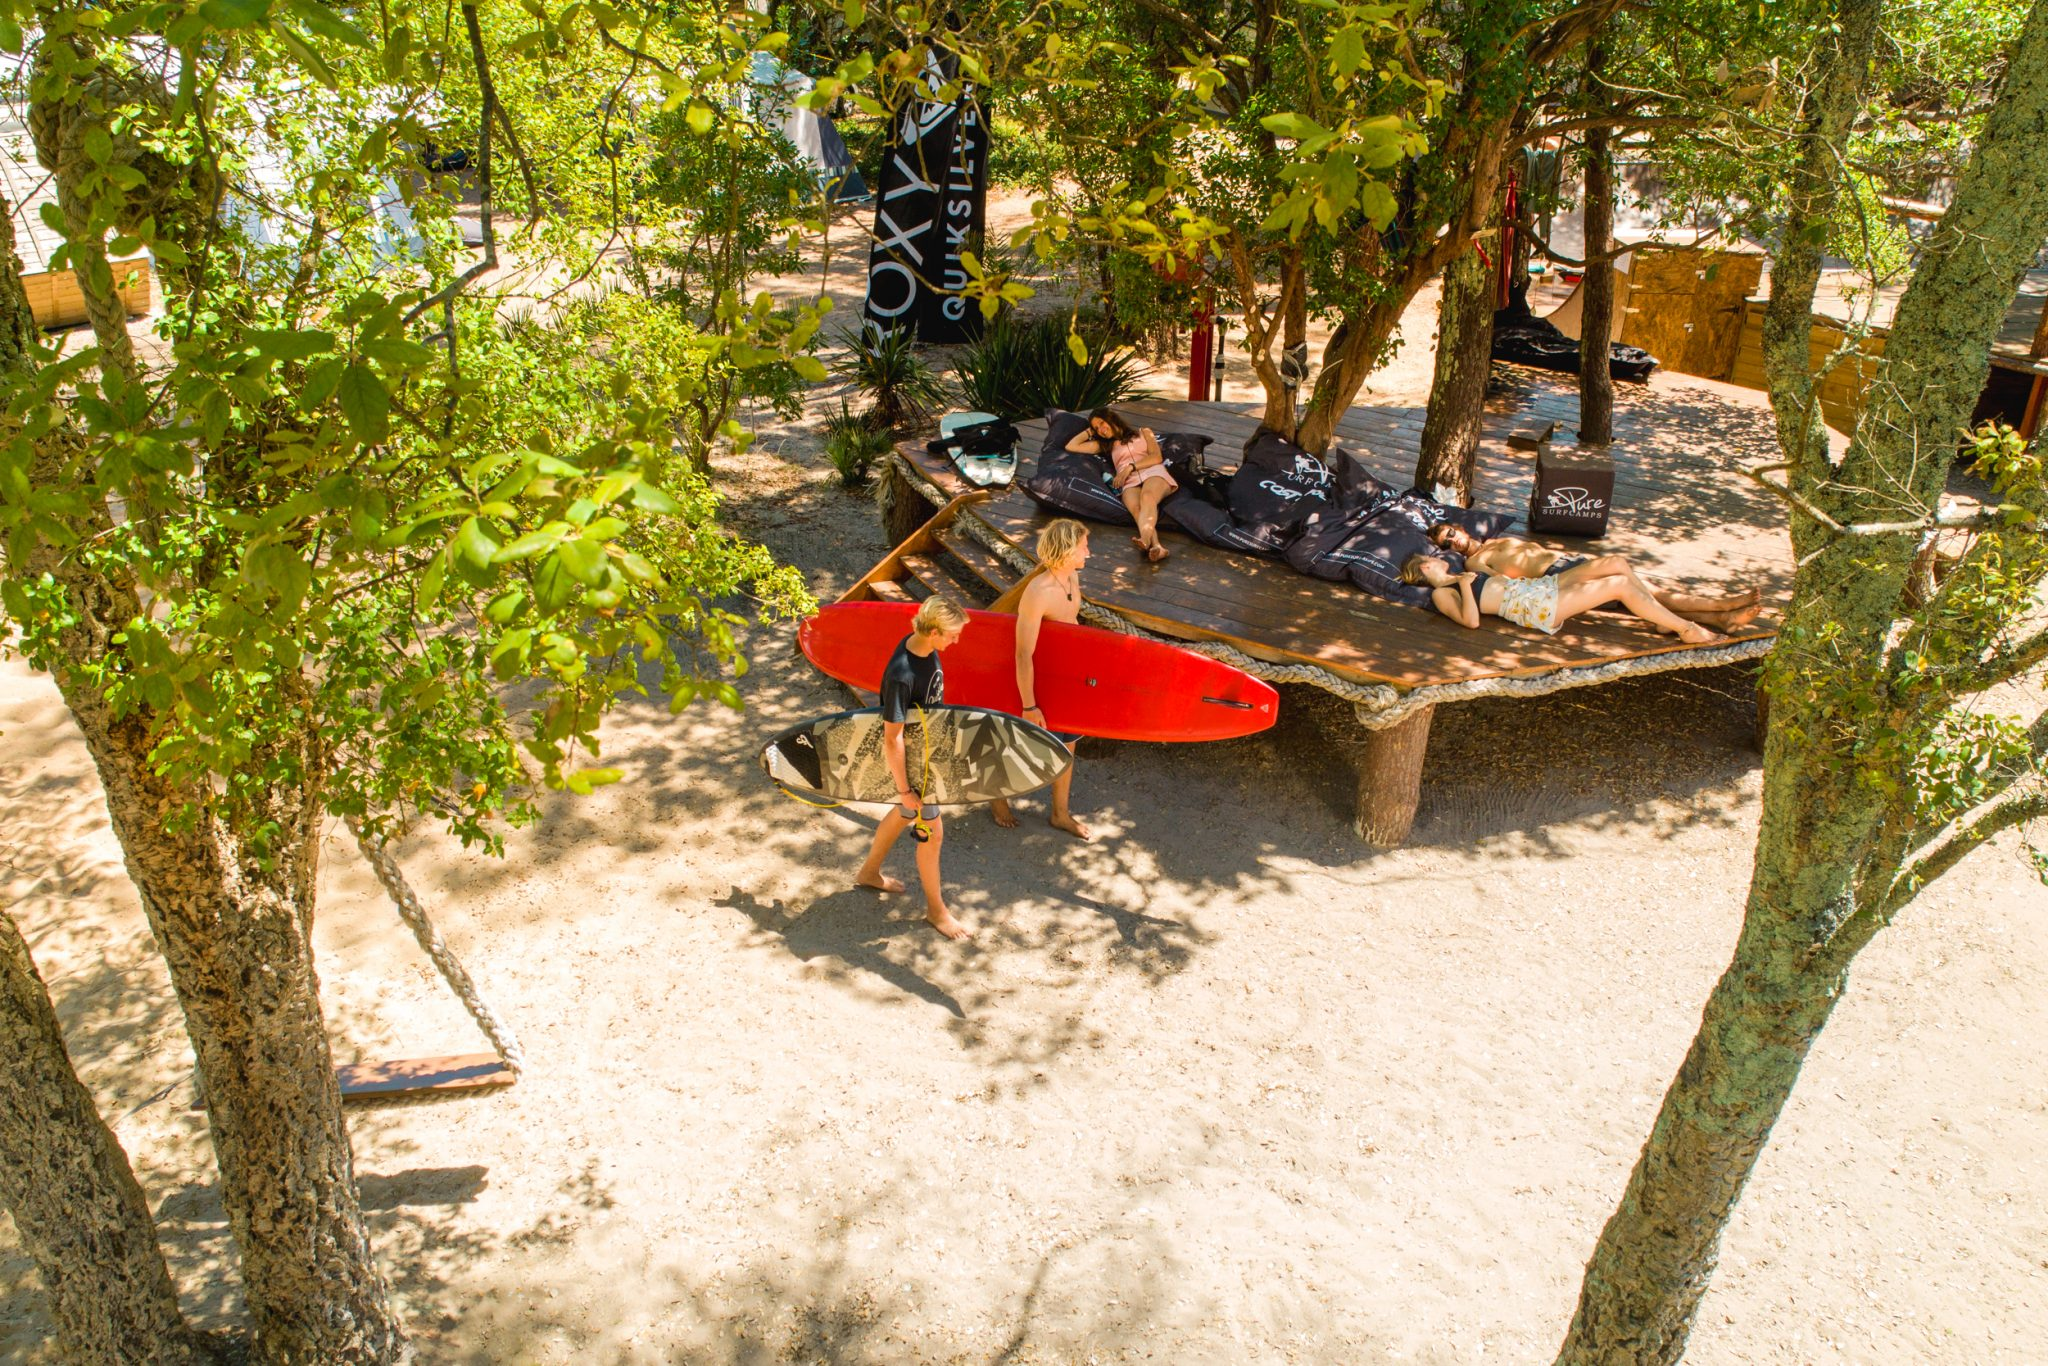 Surfcamp Suche, Chillarea bei Pure Surfcamps